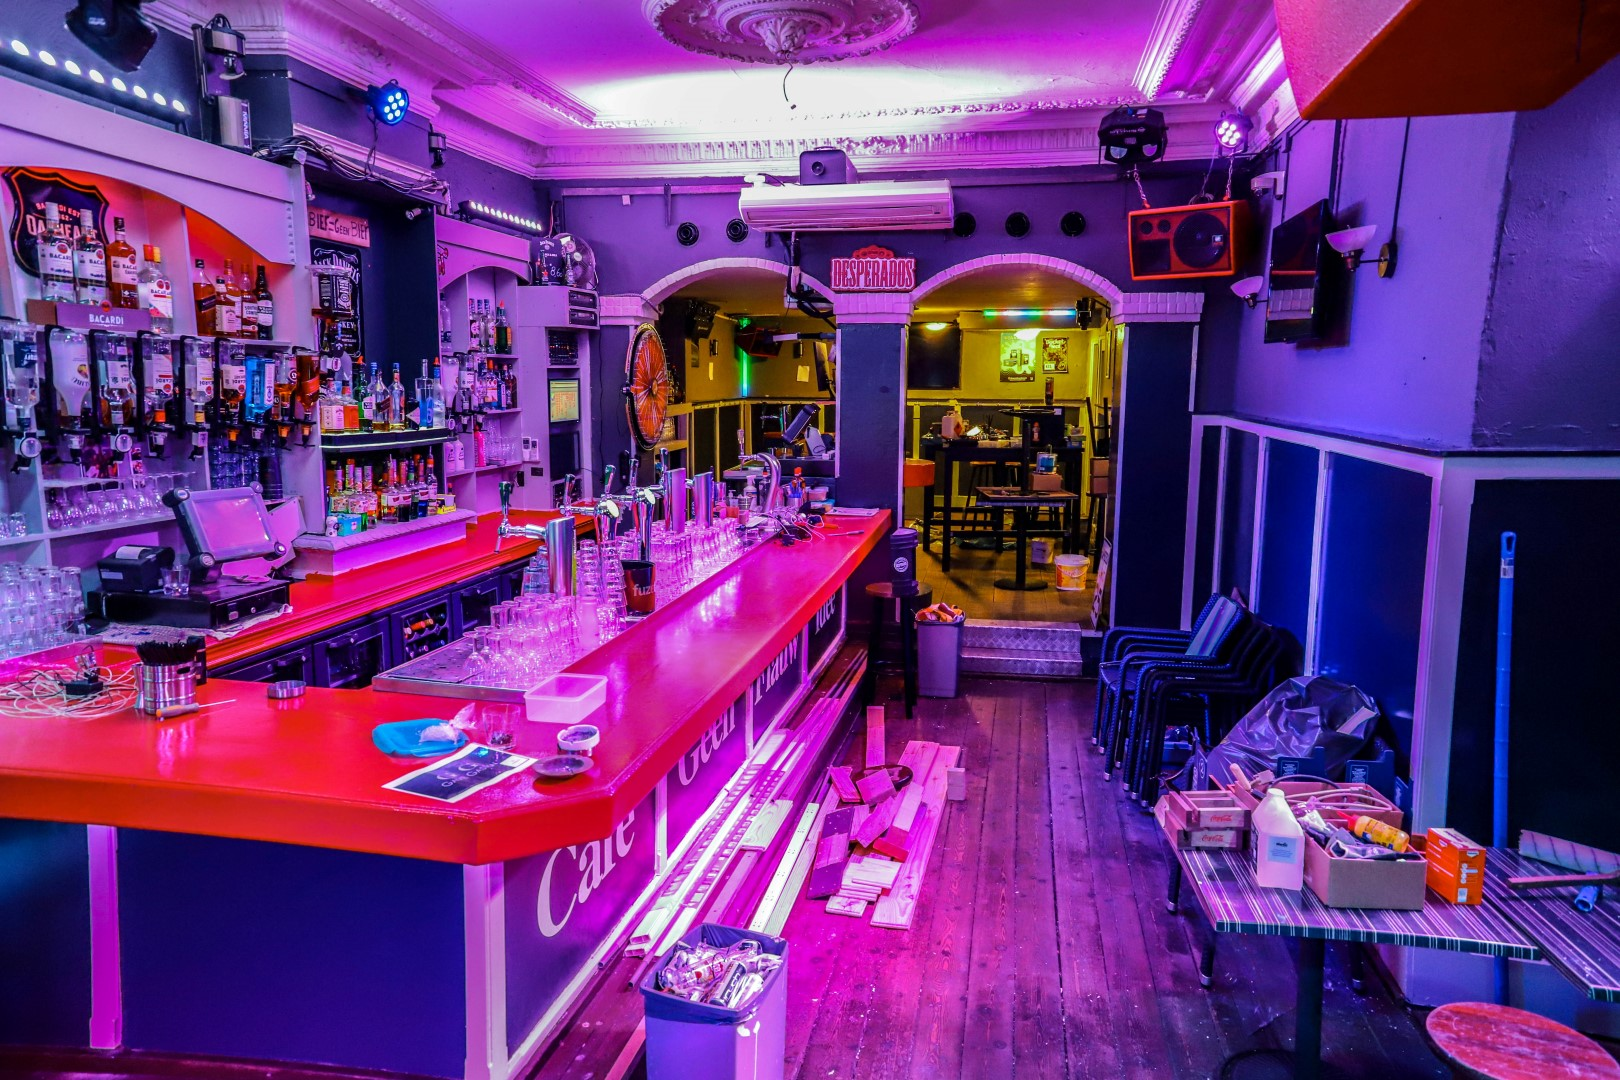 cafe café geen flauw idee gfi markt uitgaan discotheek verbouwing